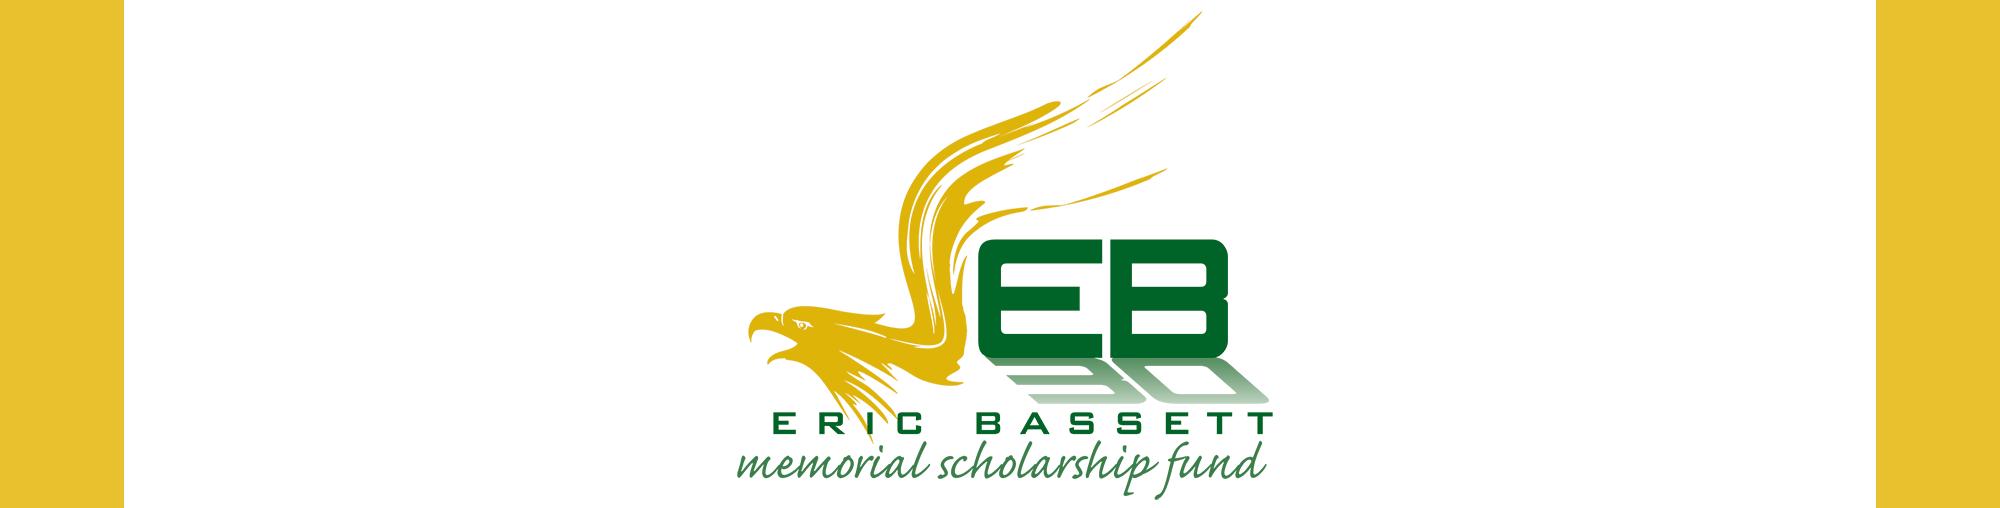 Eric Bassett Memorial